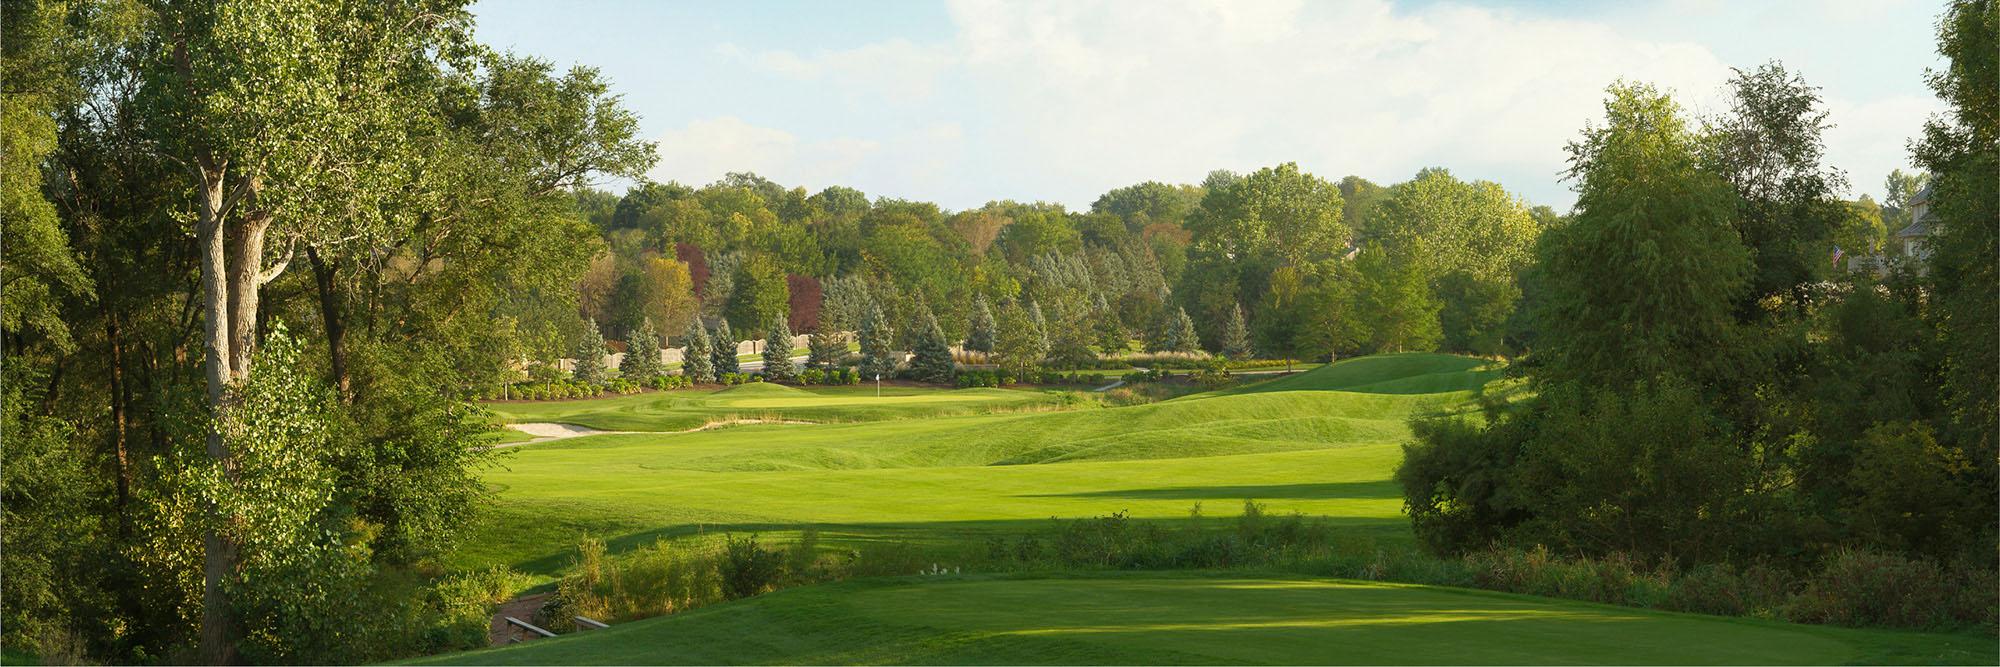 Golf Course Image - Champions Run No. 2